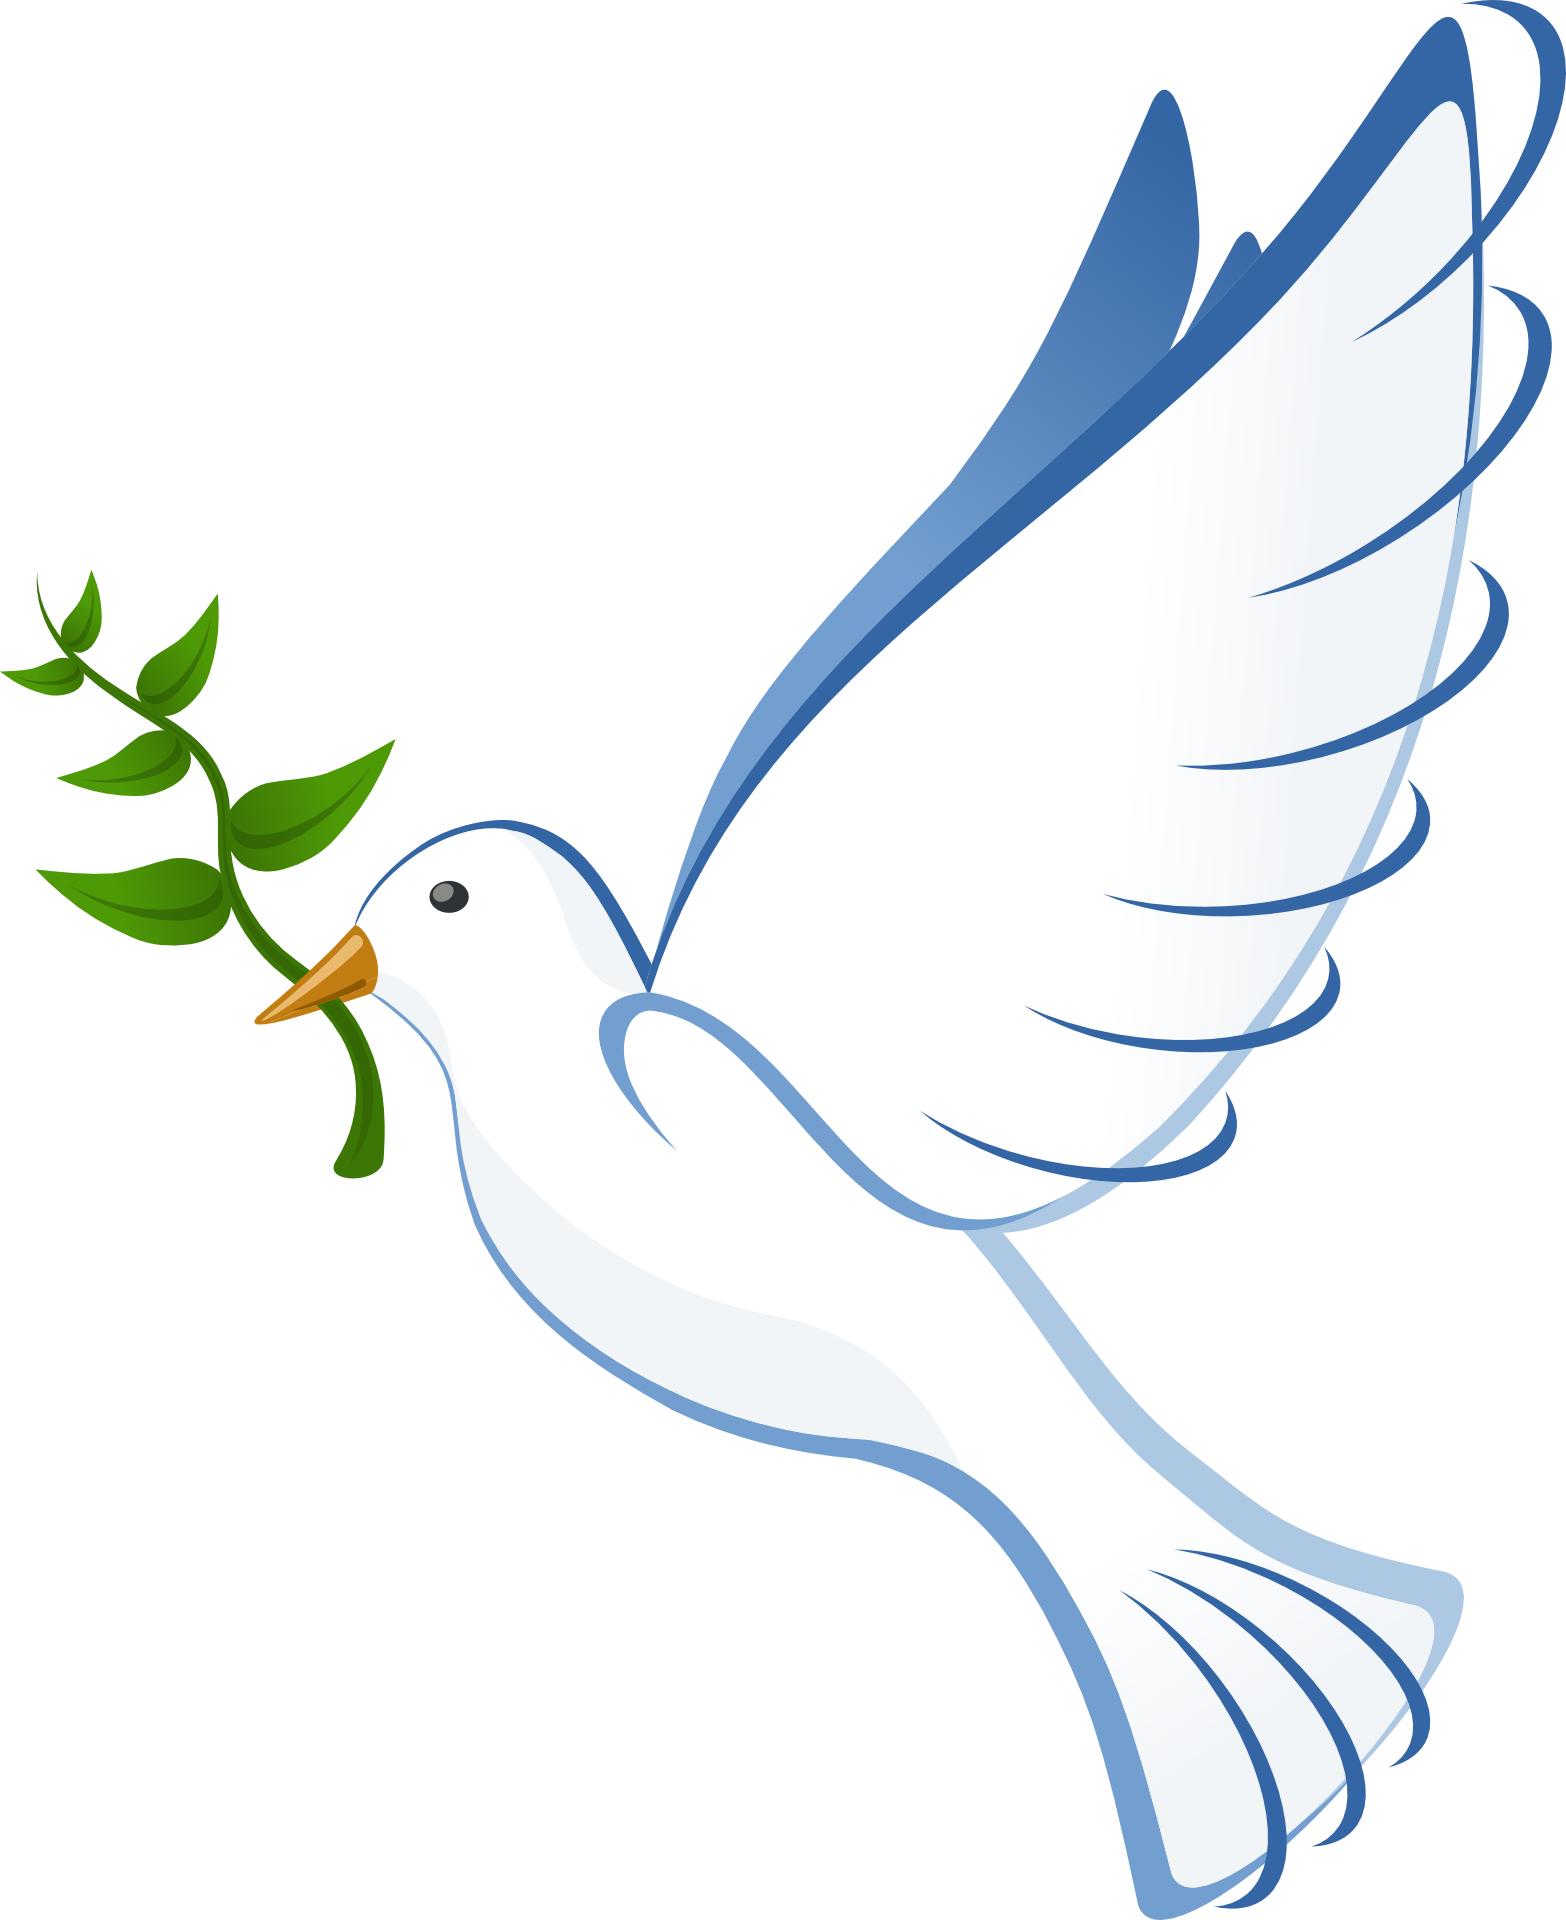 Cartoon bird - peace dove vector